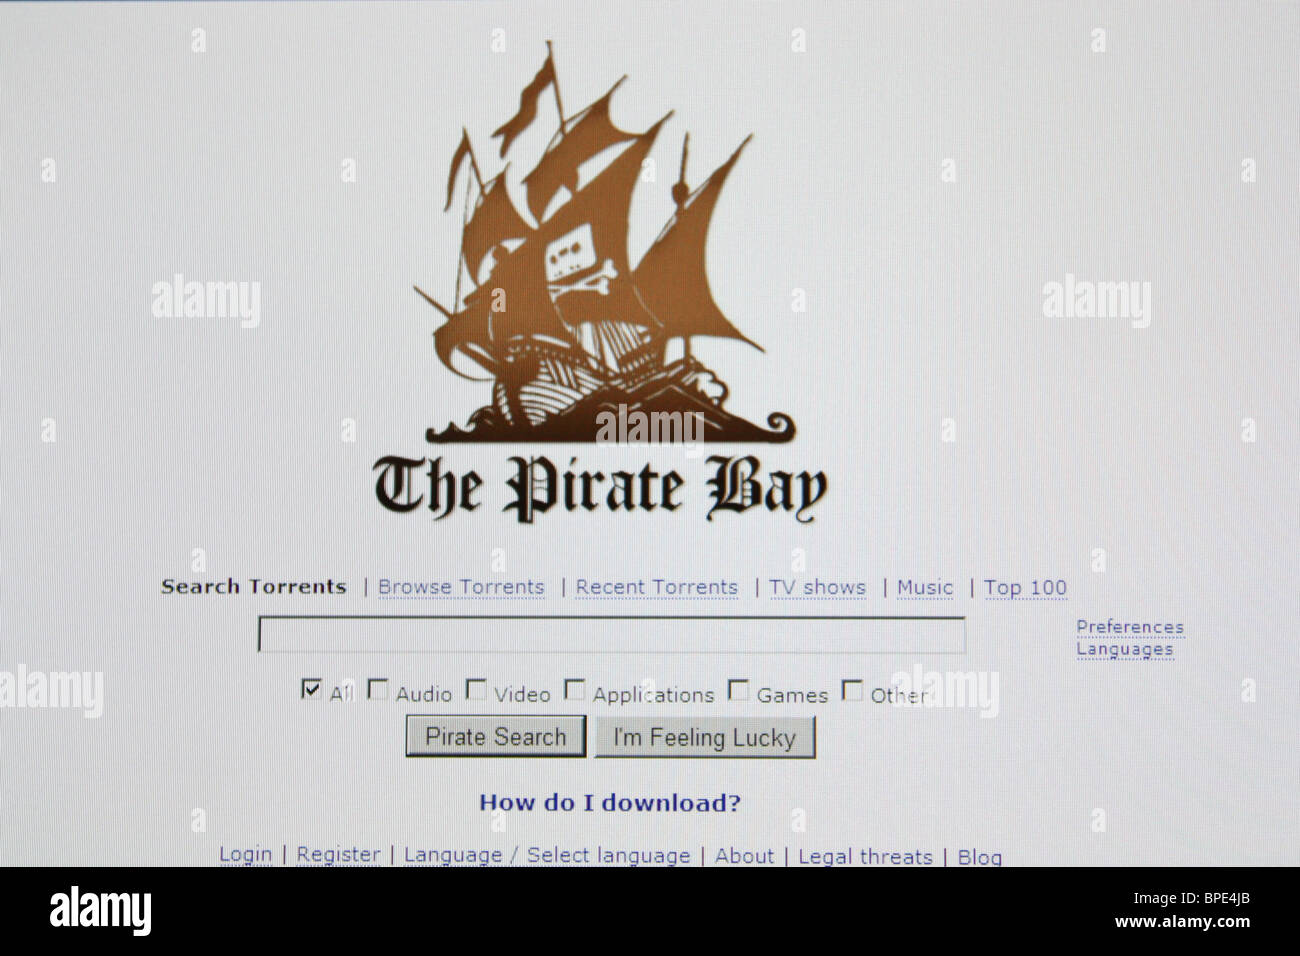 Theprivatebay Musik Filme Spielesoftware herunterladen Stockbild